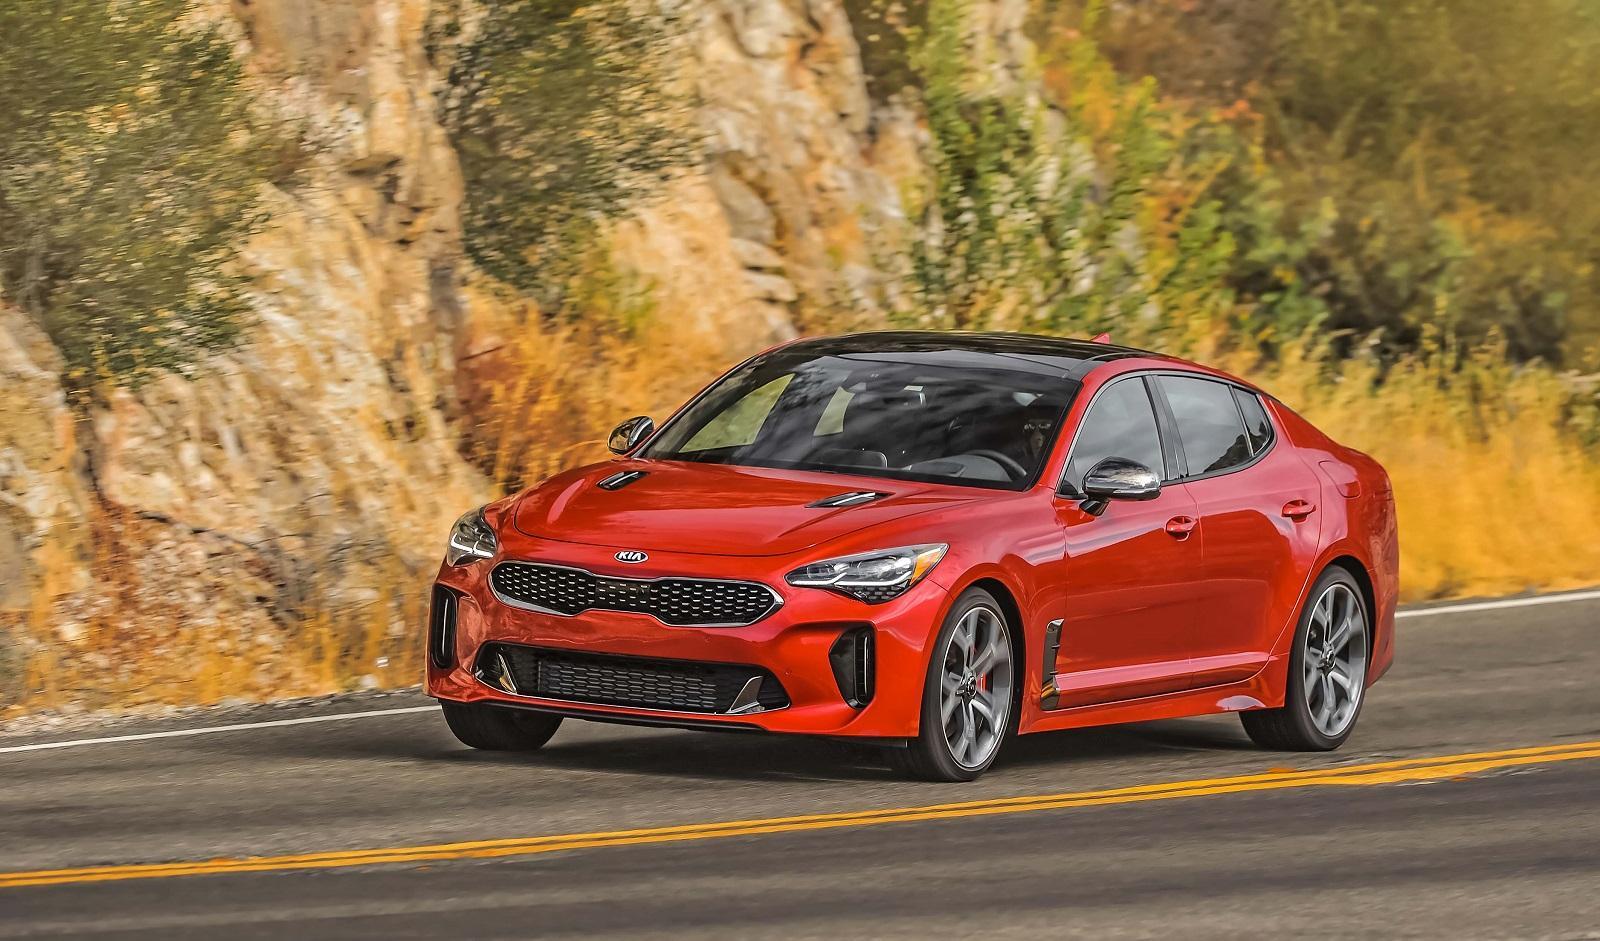 2019 Kia Stinger Lease Buy Autolux Sales Leasing